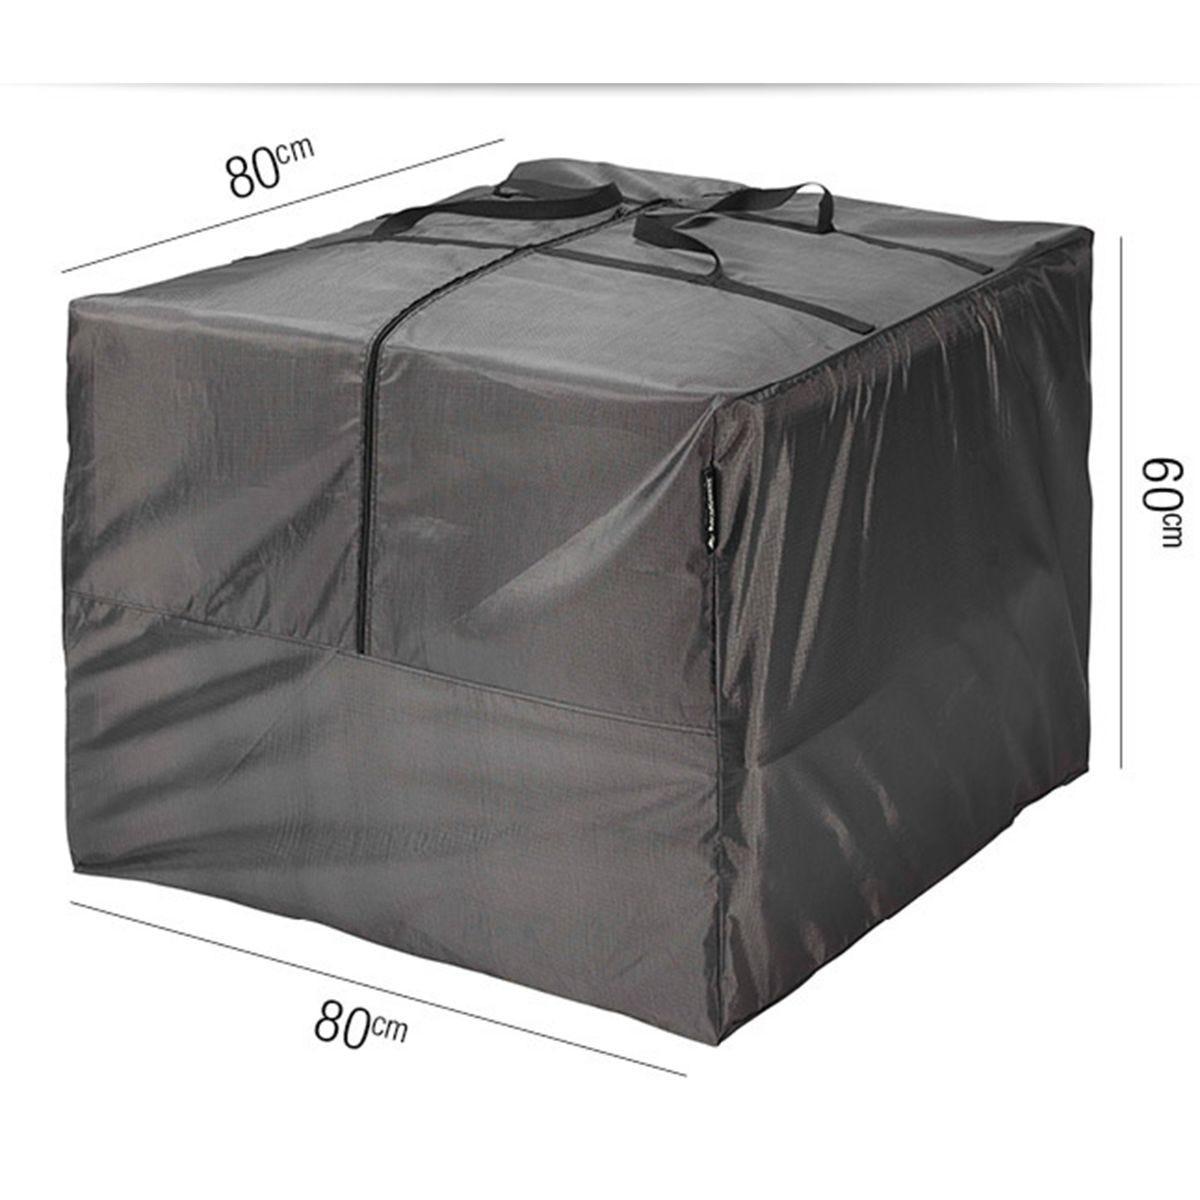 Cushion Bag Aerocover 80 x 80 x 60cm